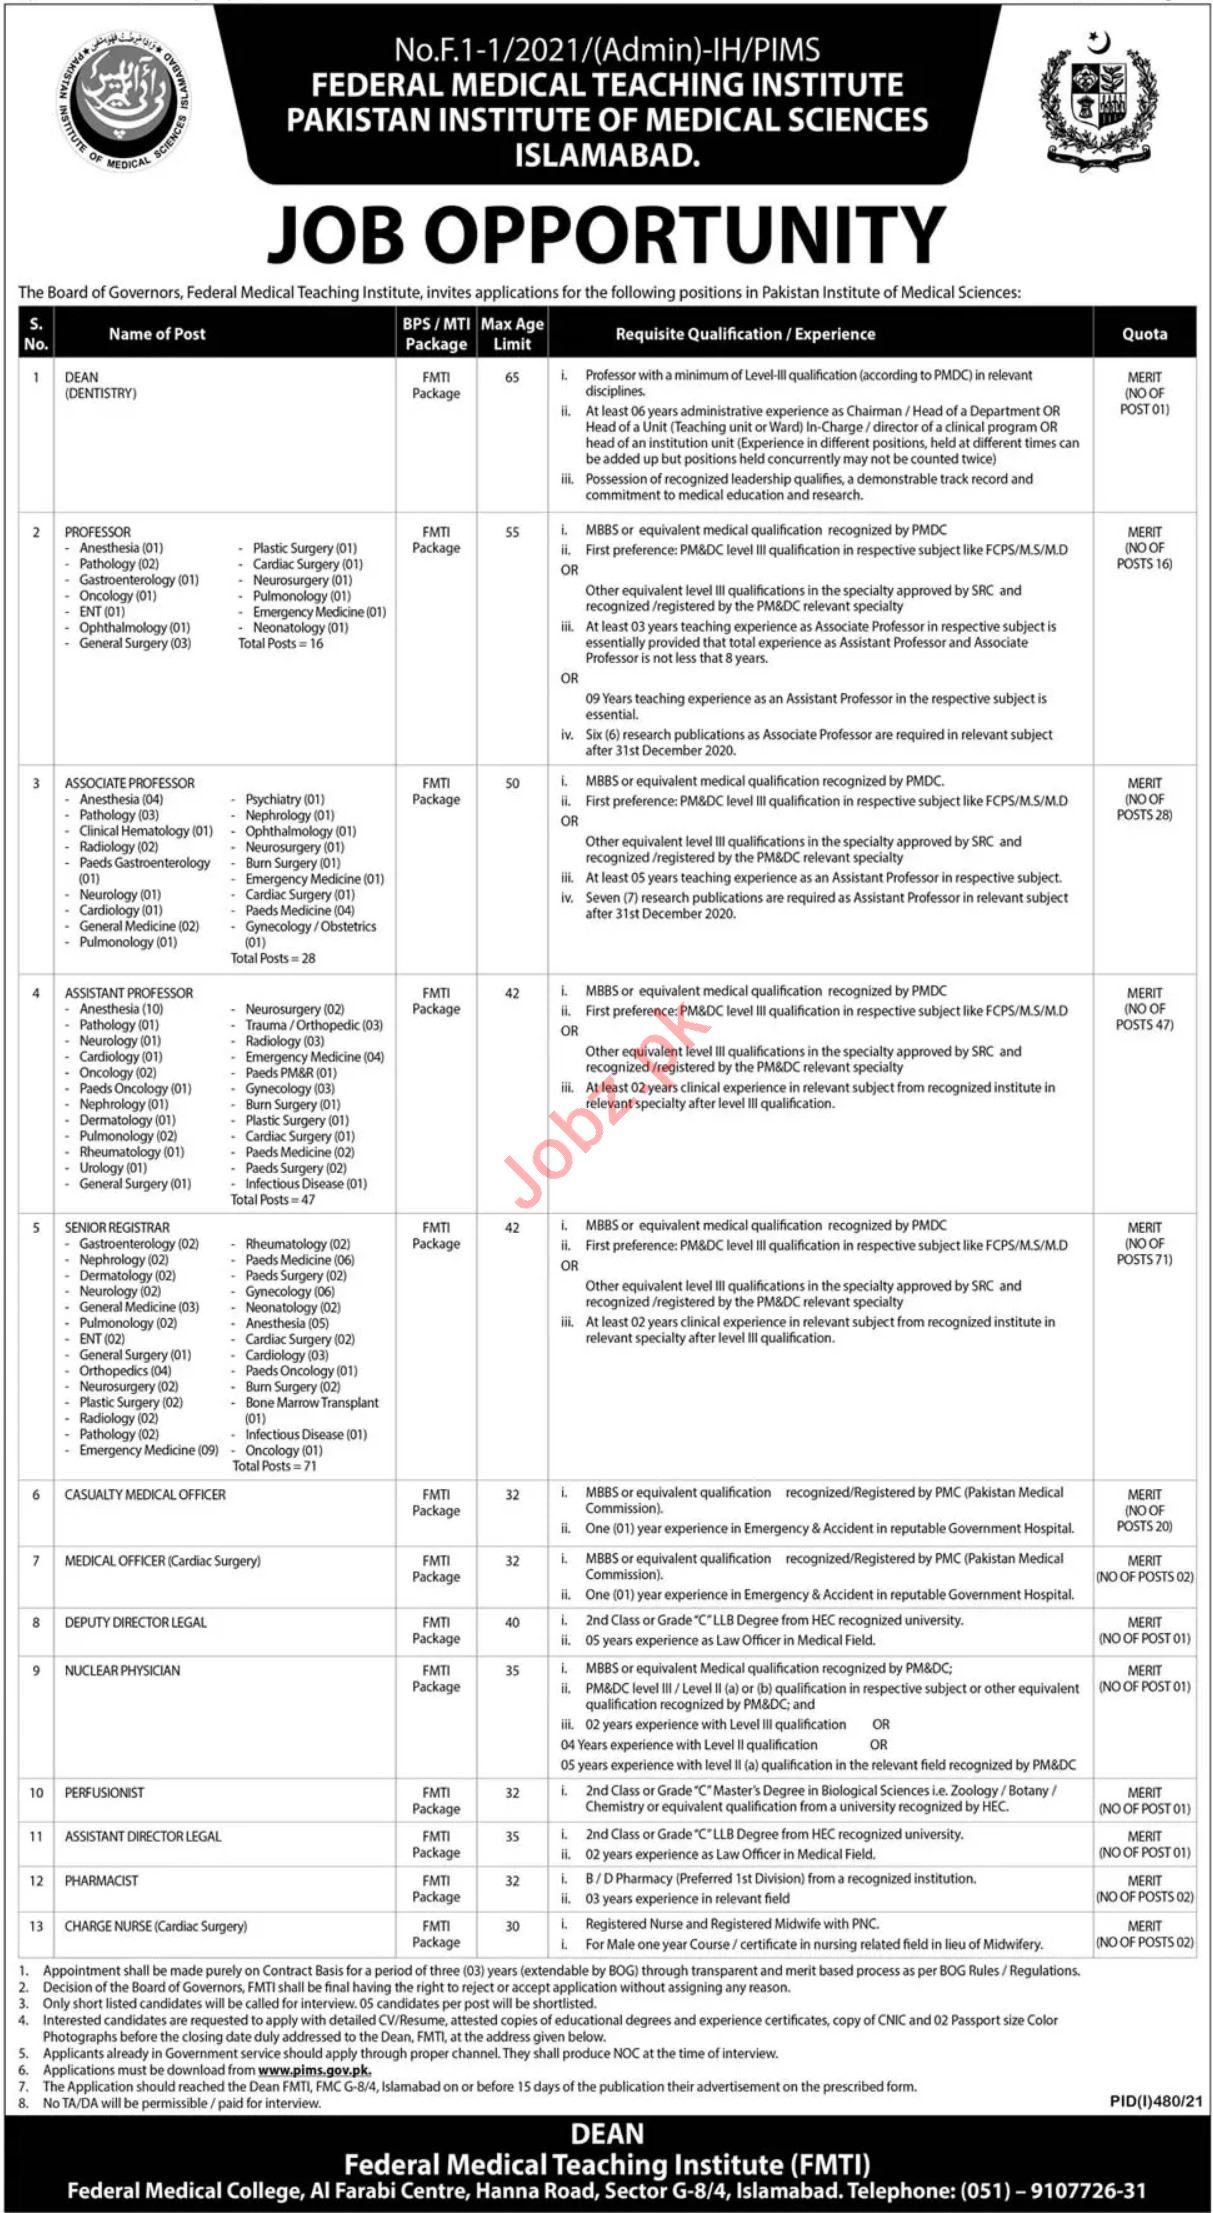 FMTI Pakistan Institute of Medical Sciences PIMS Jobs 2021